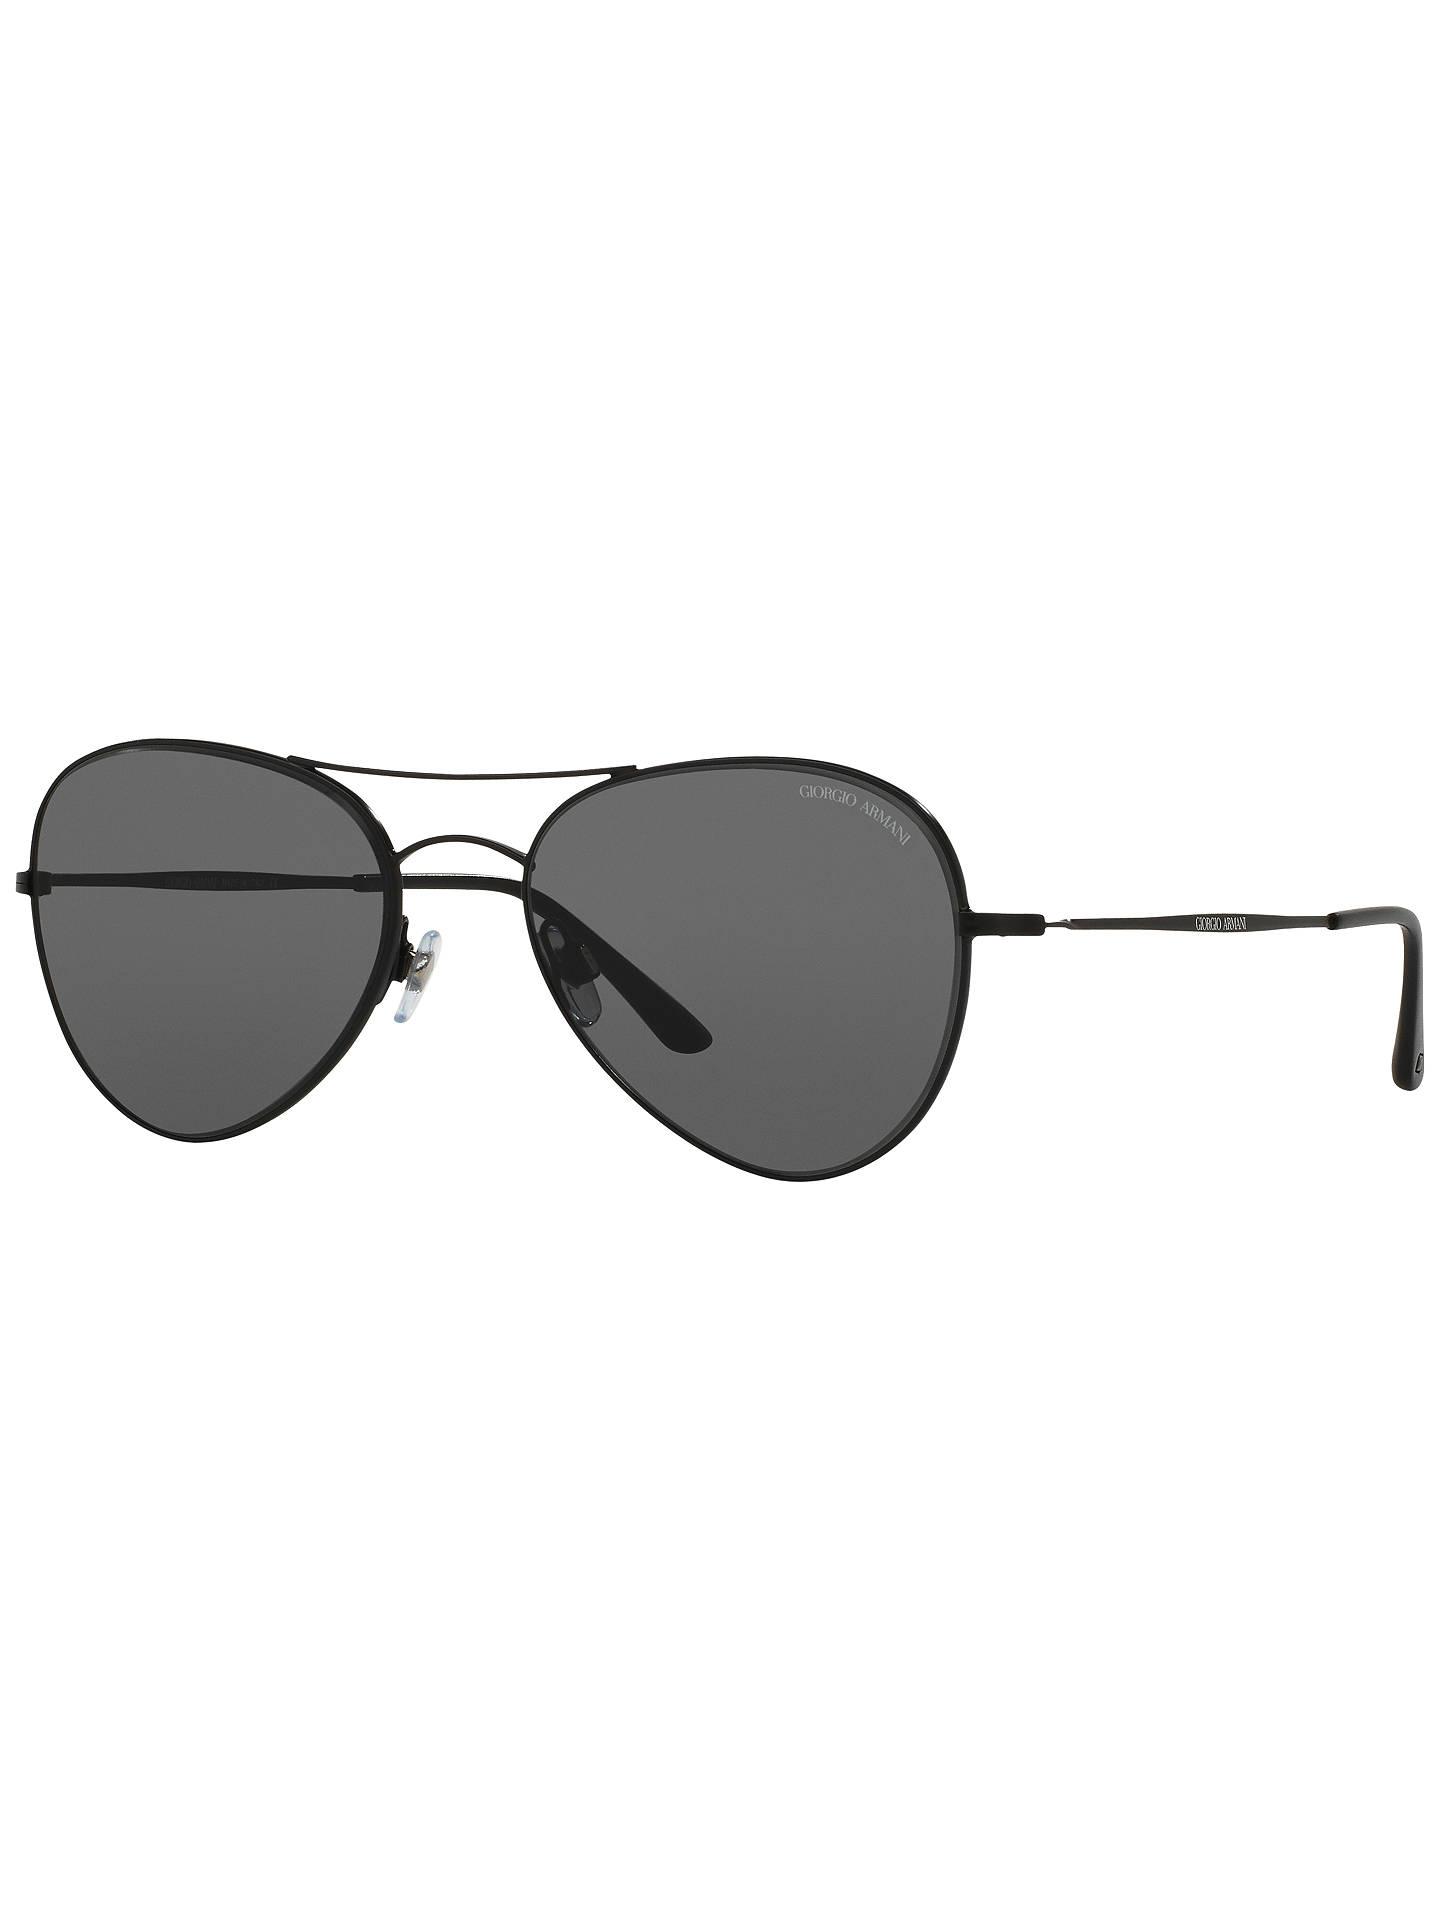 87c054c621c Giorgio Armani AR6035 Aviator Sunglasses at John Lewis   Partners